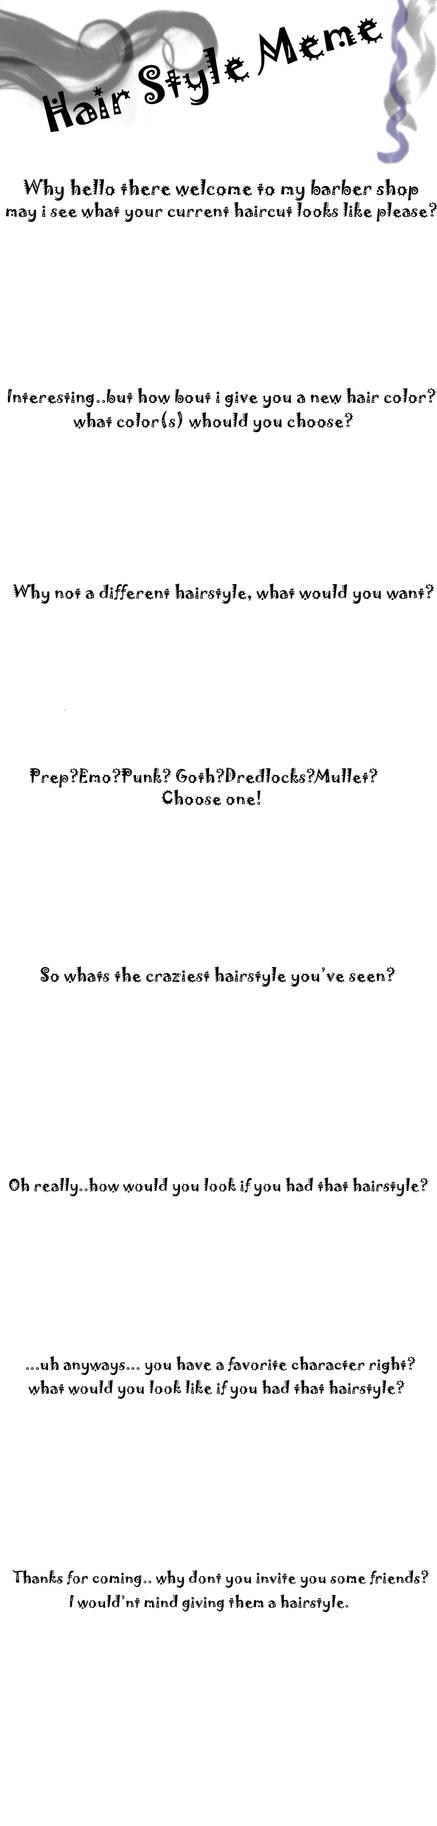 Hairstyle Meme-Blank by RandomSkilled